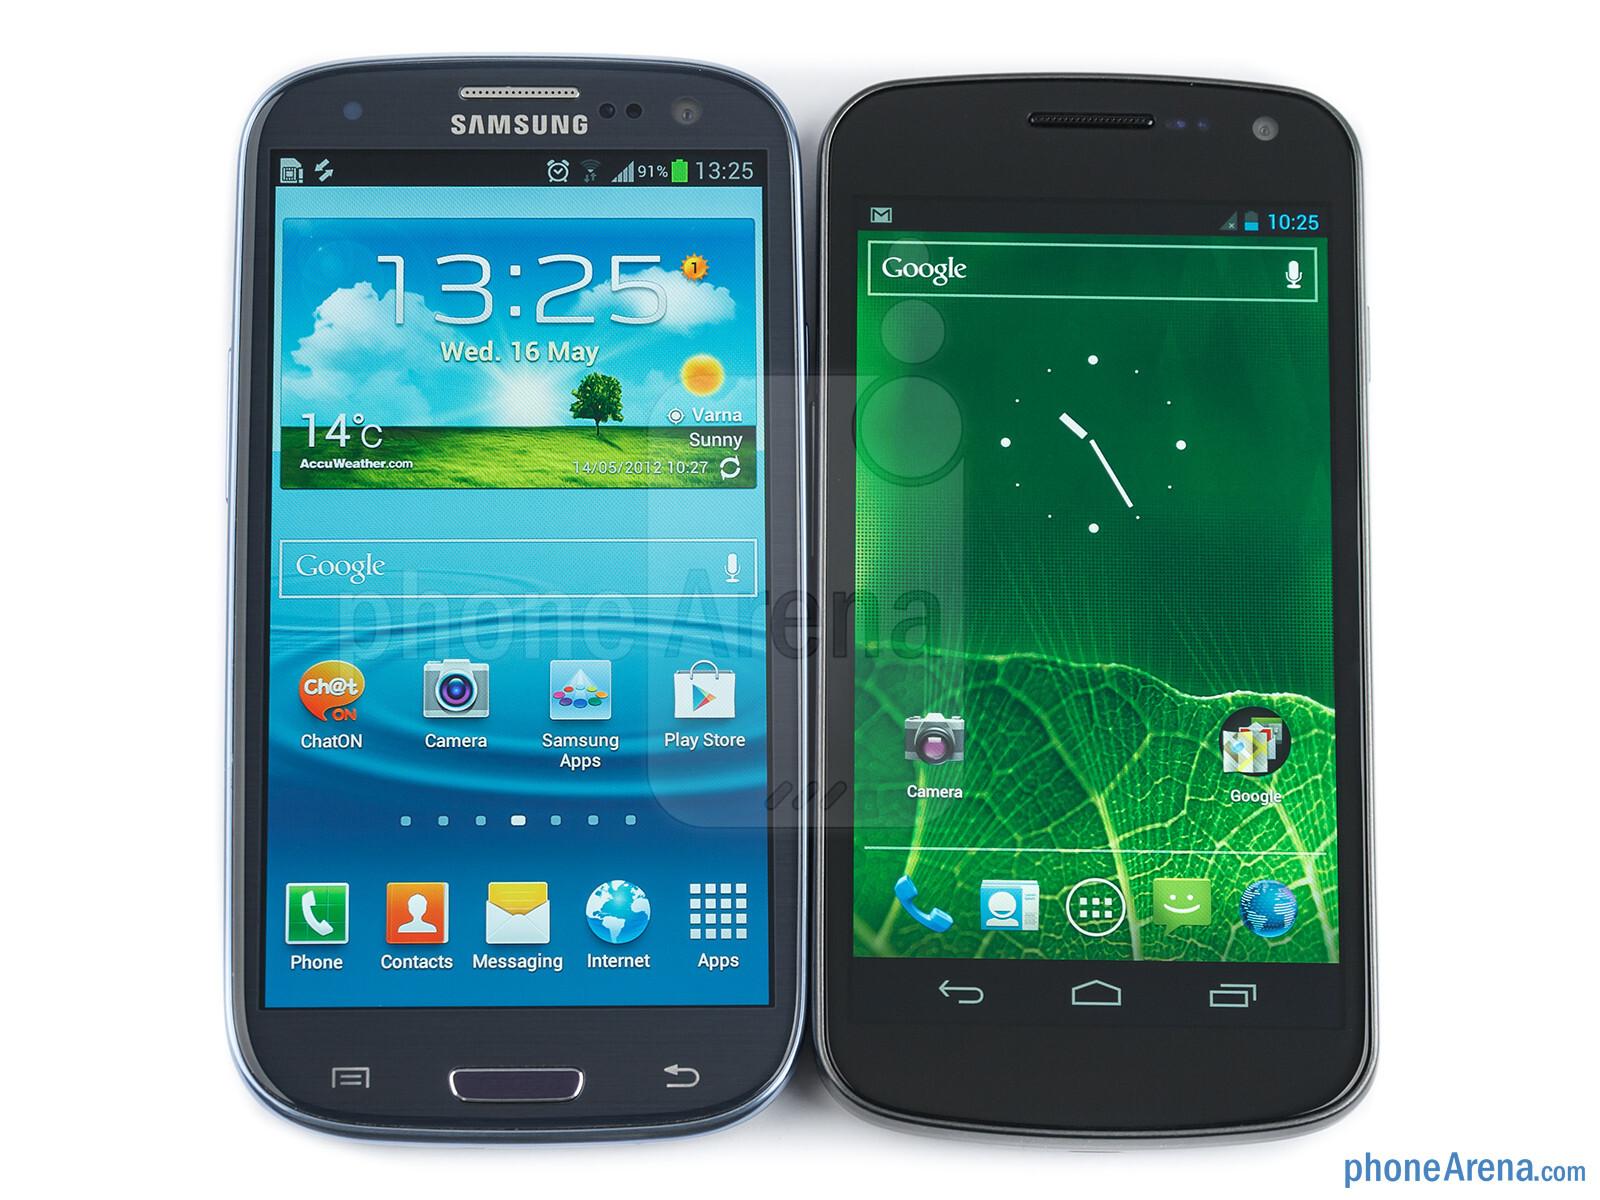 Samsung Galaxy V: Samsung Galaxy S III Vs Samsung Galaxy Nexus